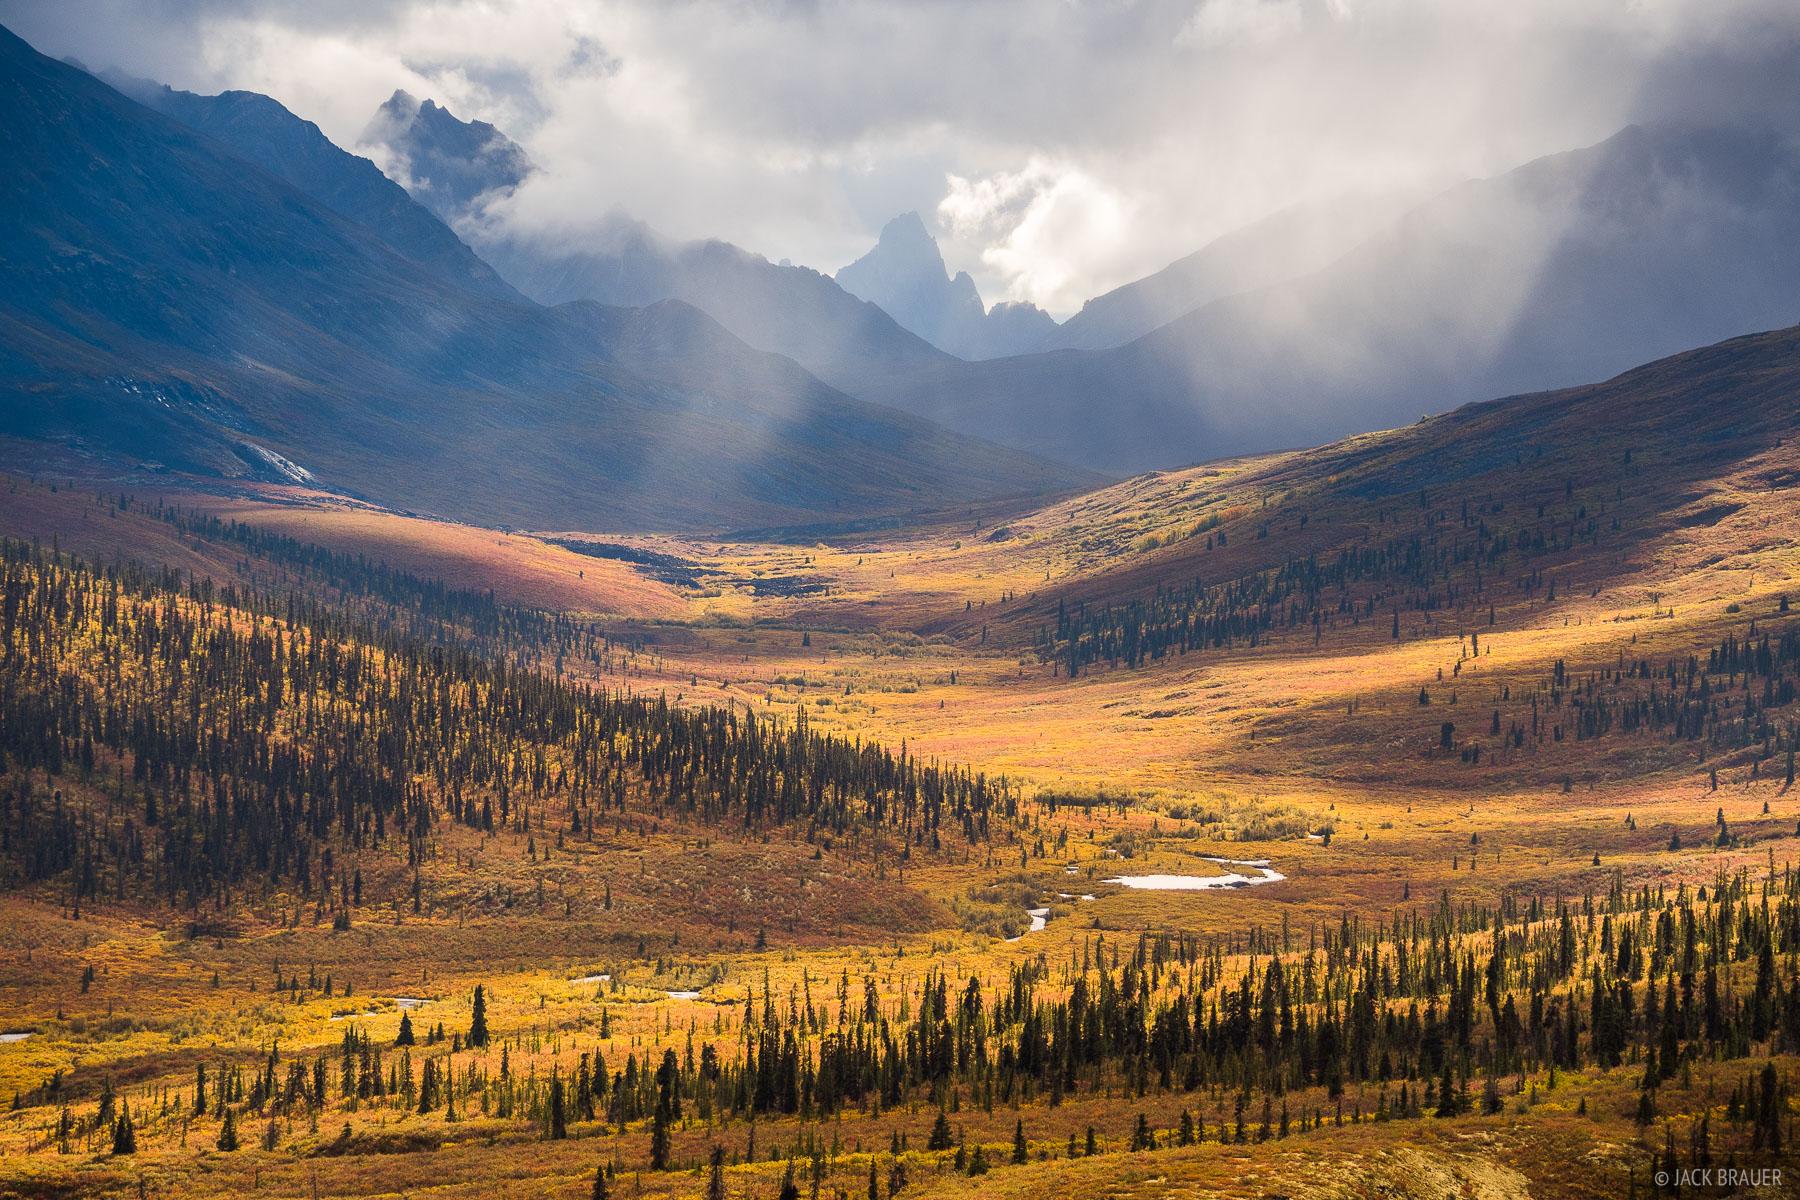 Canada, Tombstone Mountain, Tombstone Territorial Park, Yukon, tundra